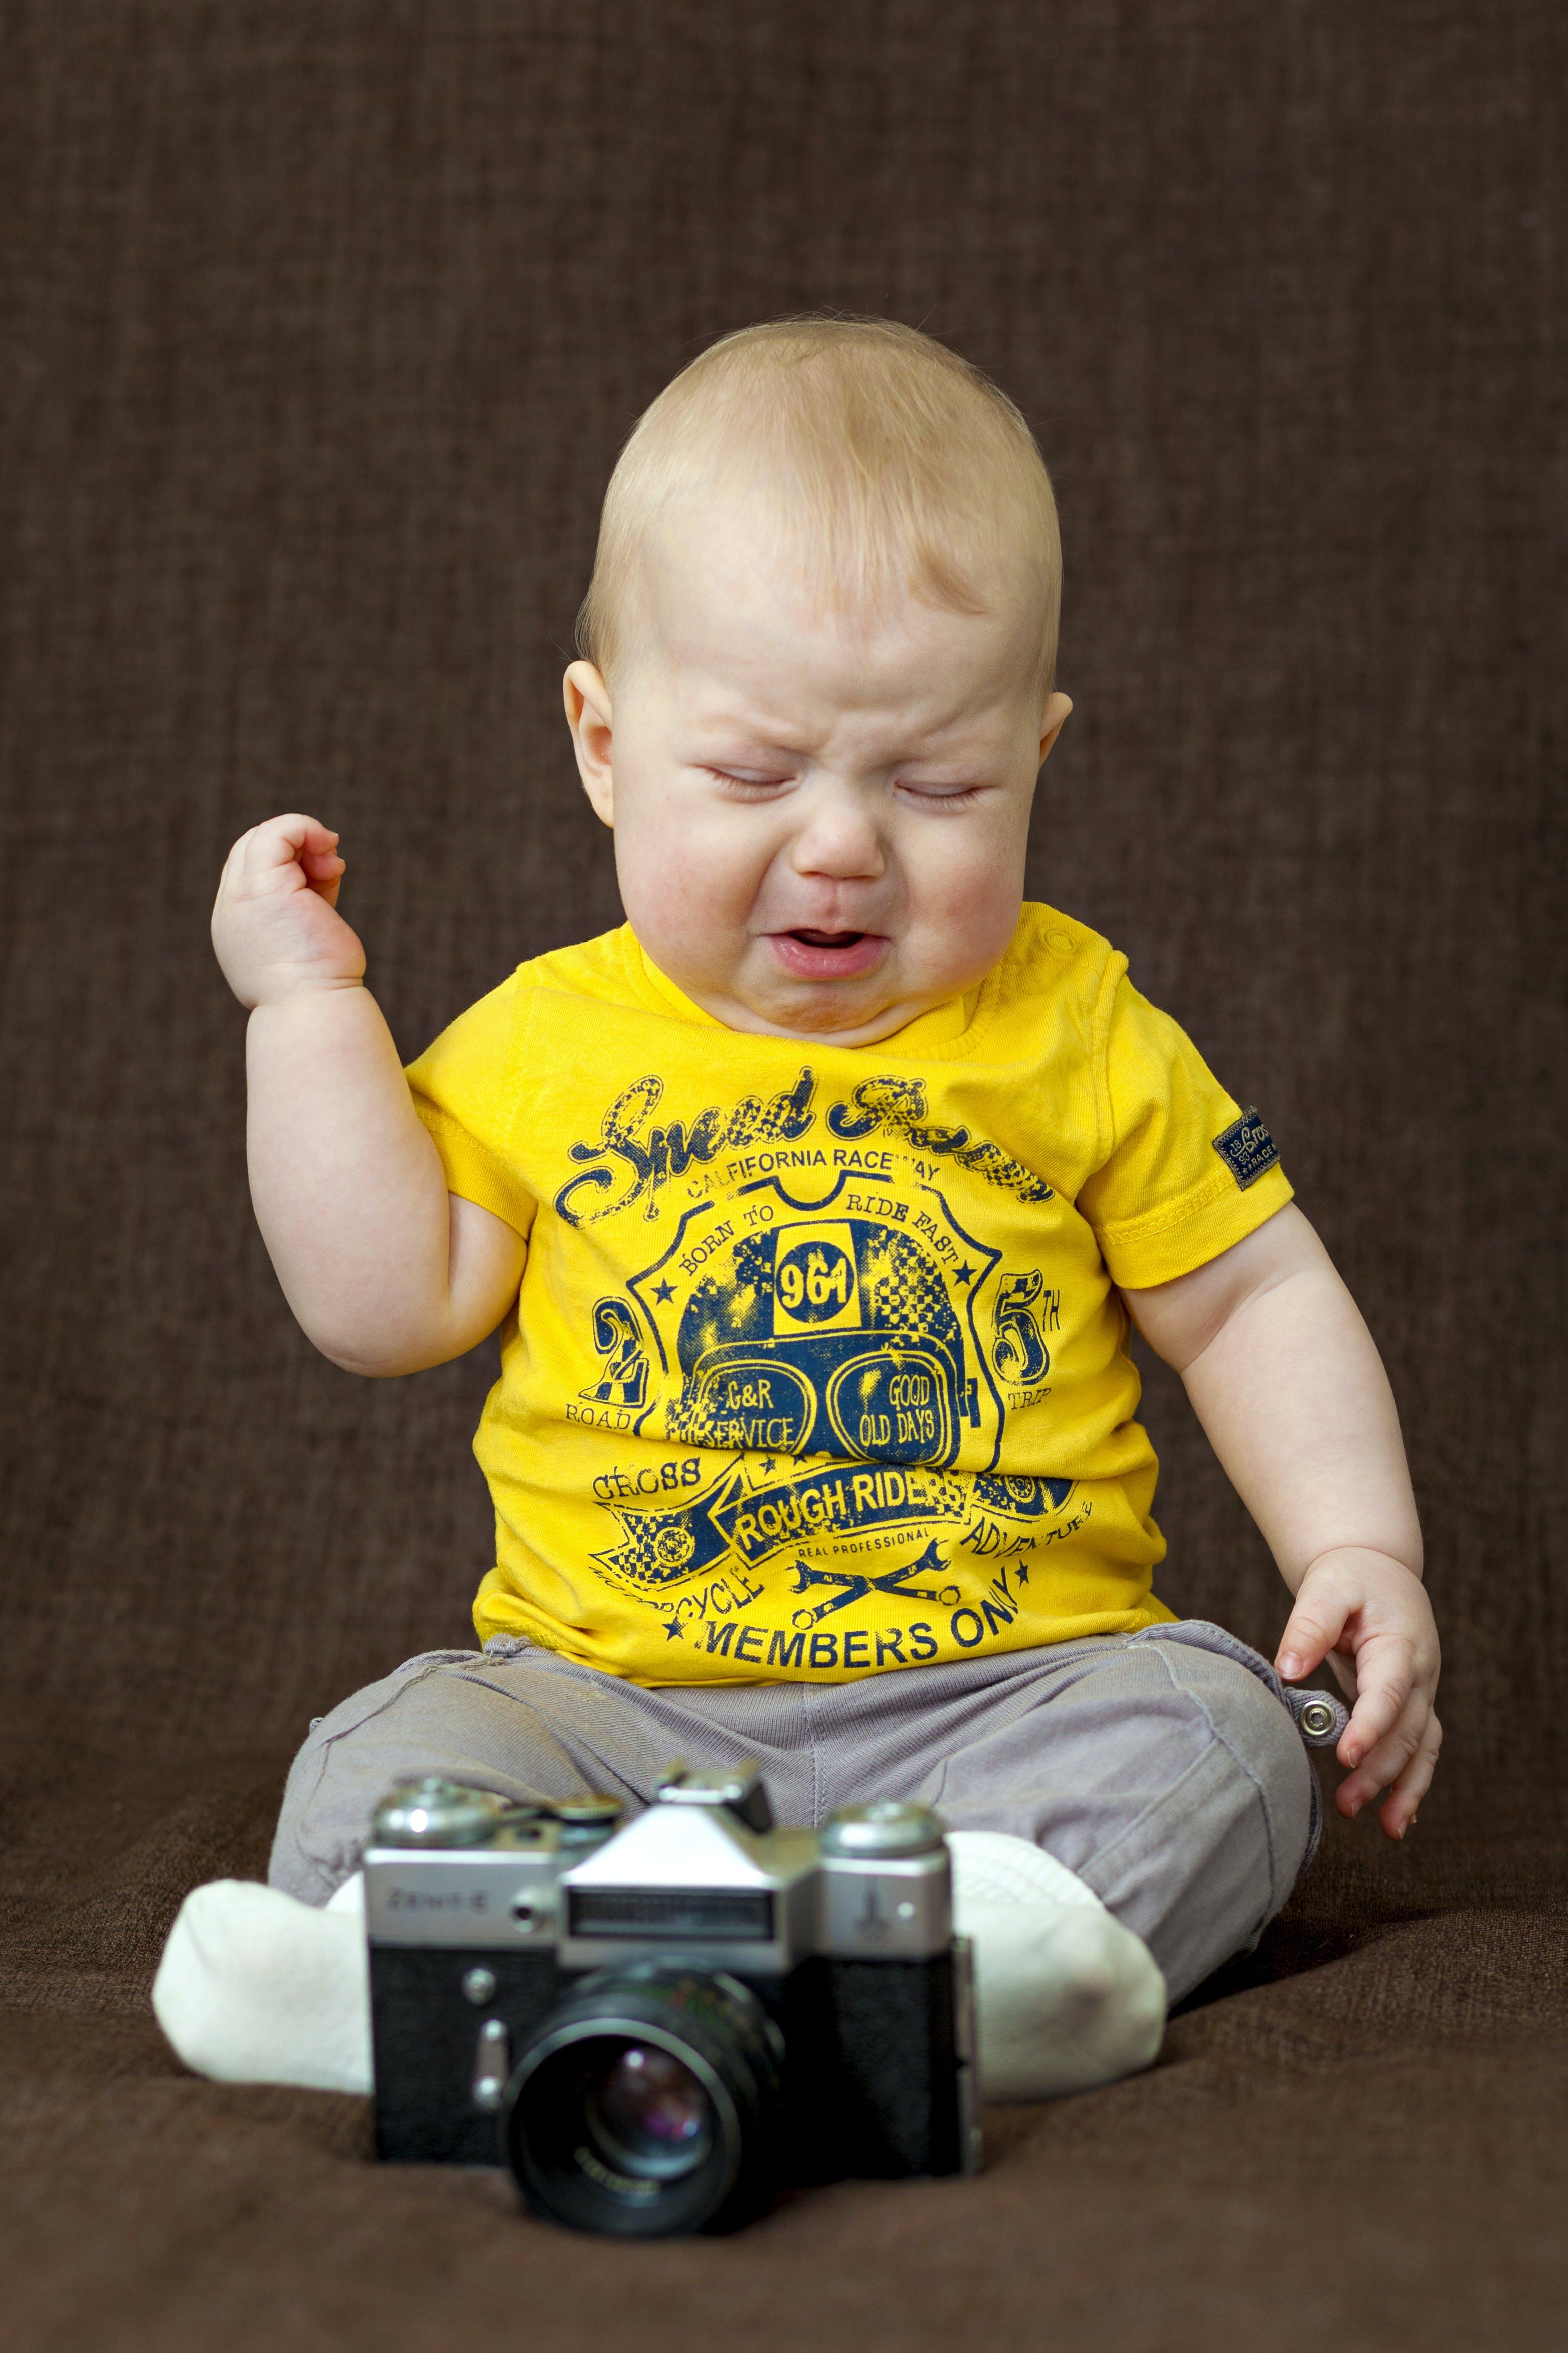 Free stock photo of analog camera, baby, cameraman, cry